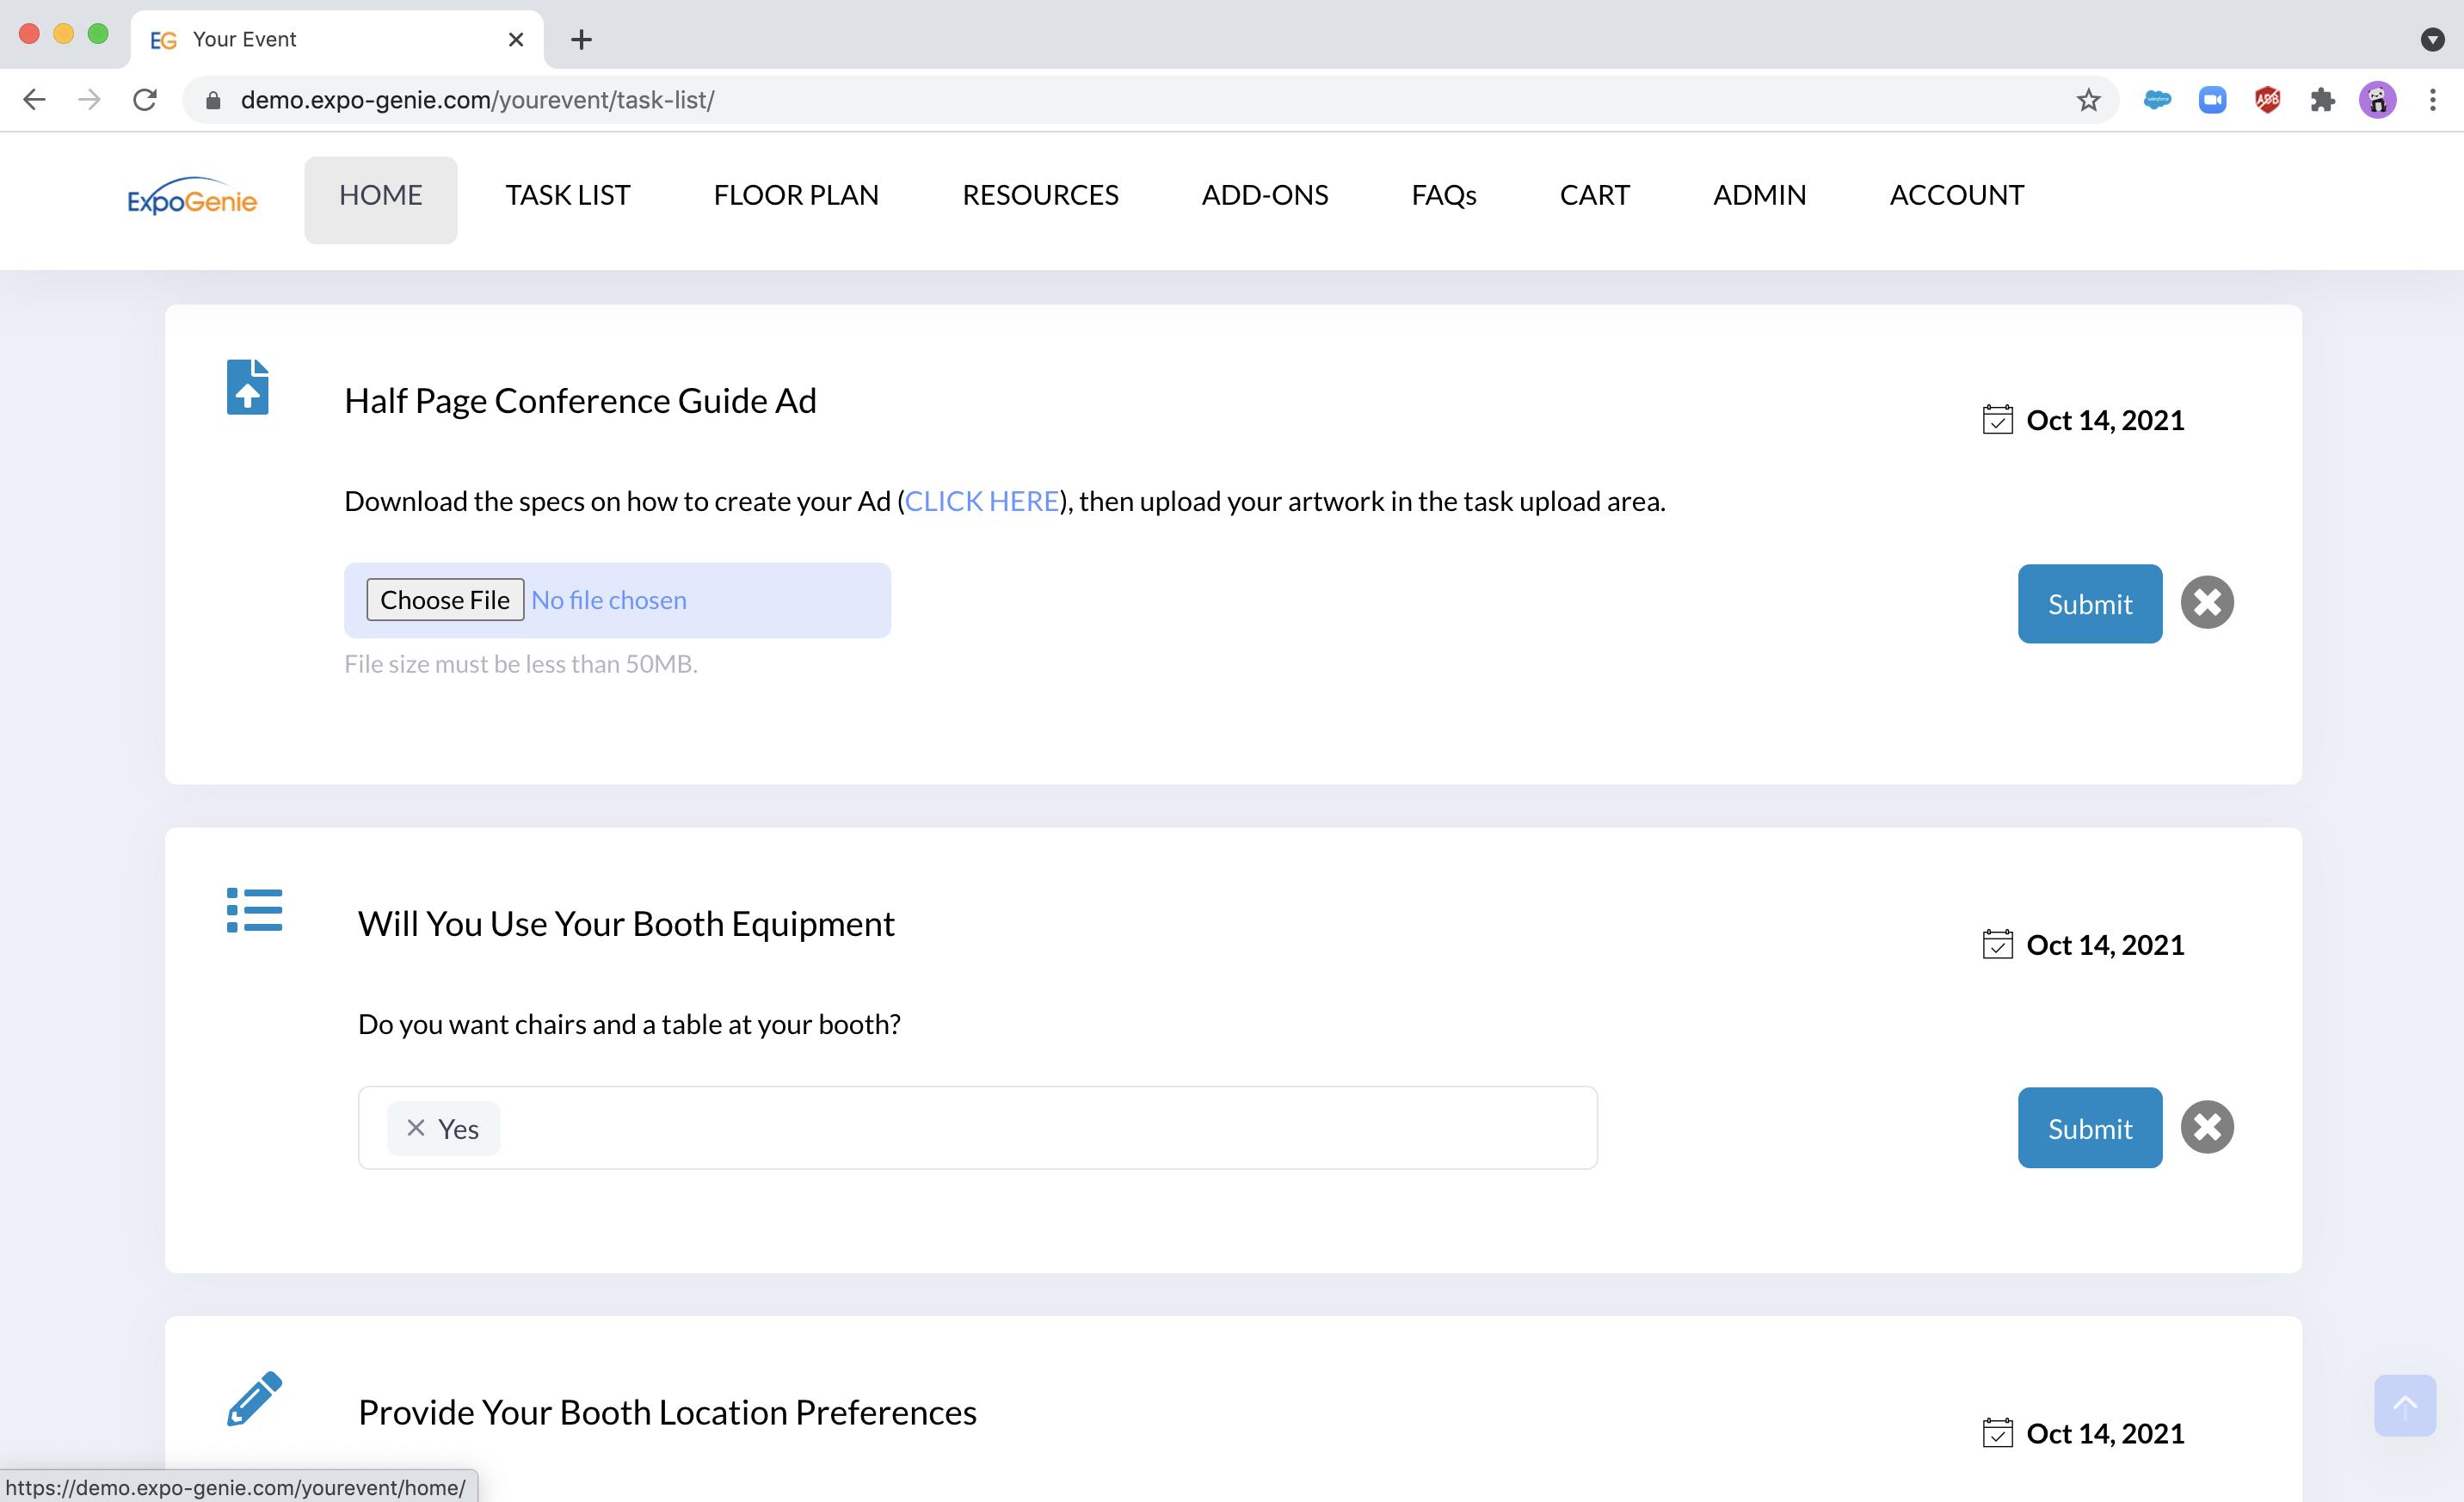 Role based task list - Exhibitors can easily upload show assets via a task list.